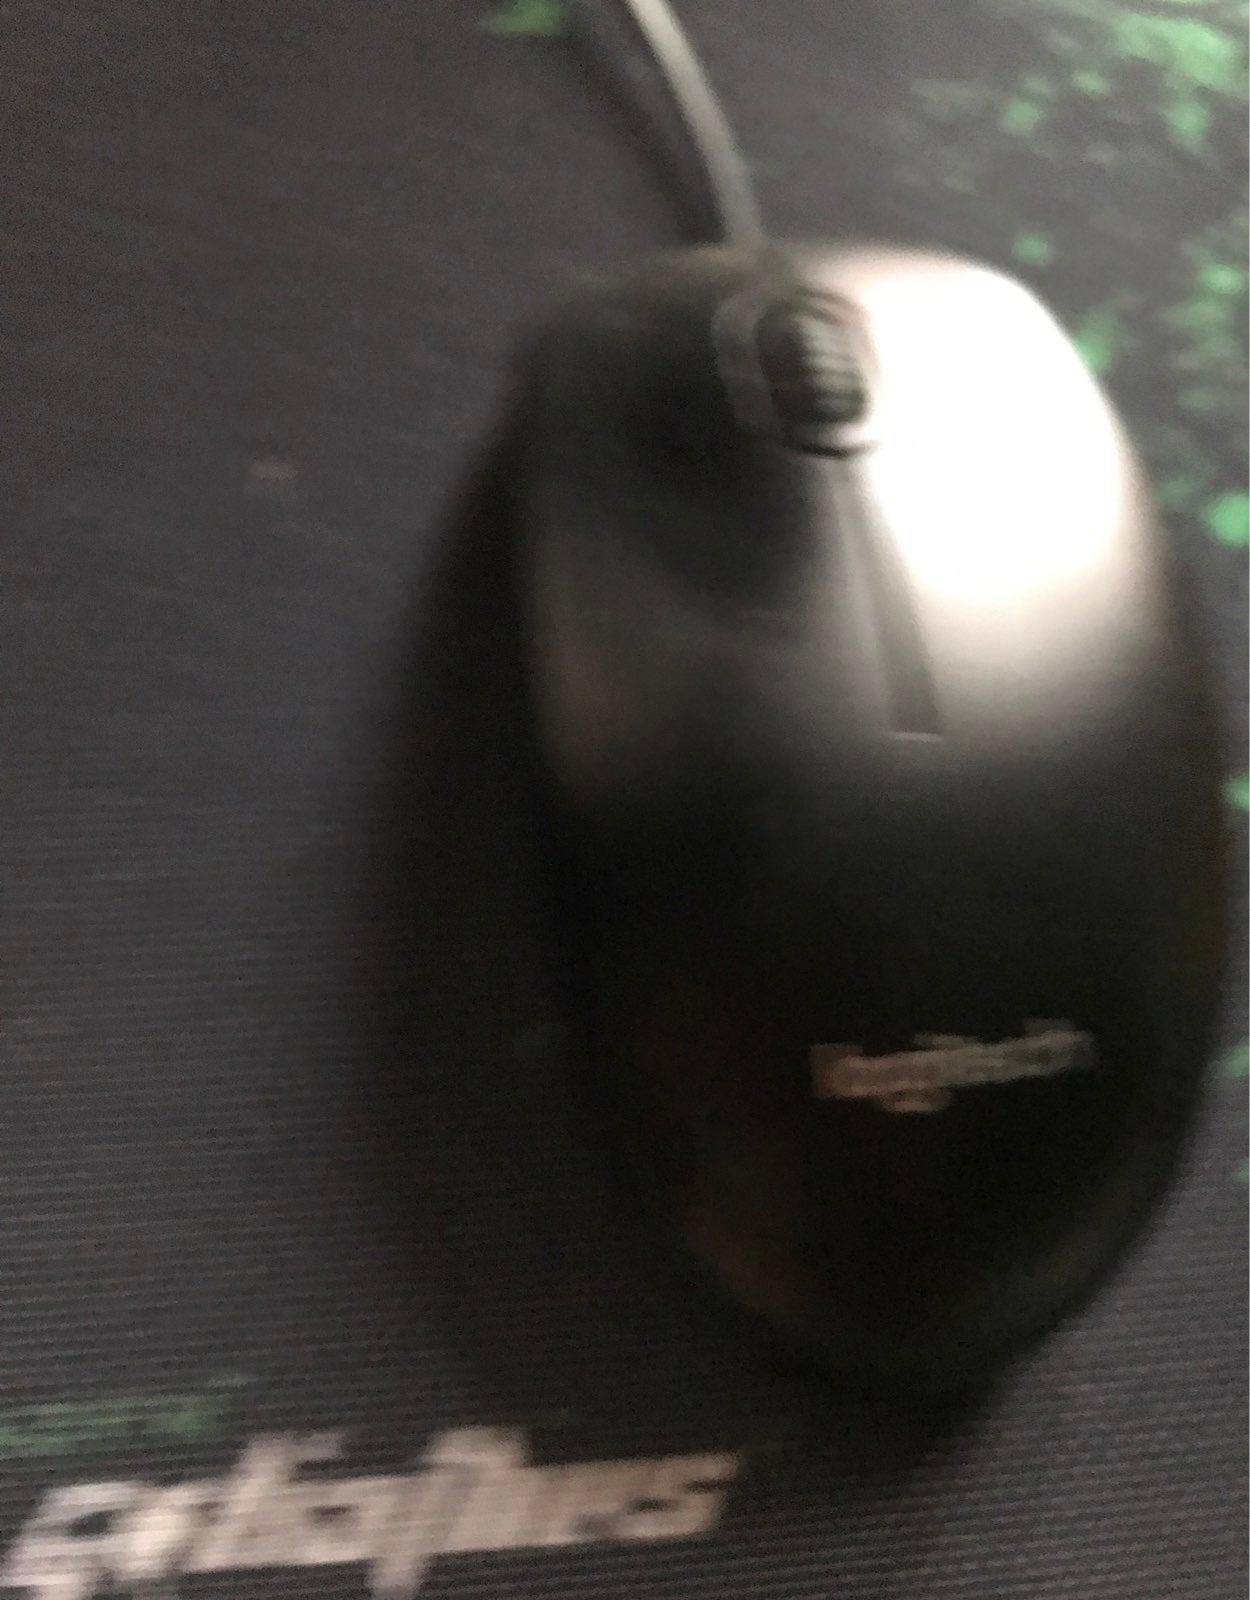 MouseCraft on Sony PS Vita